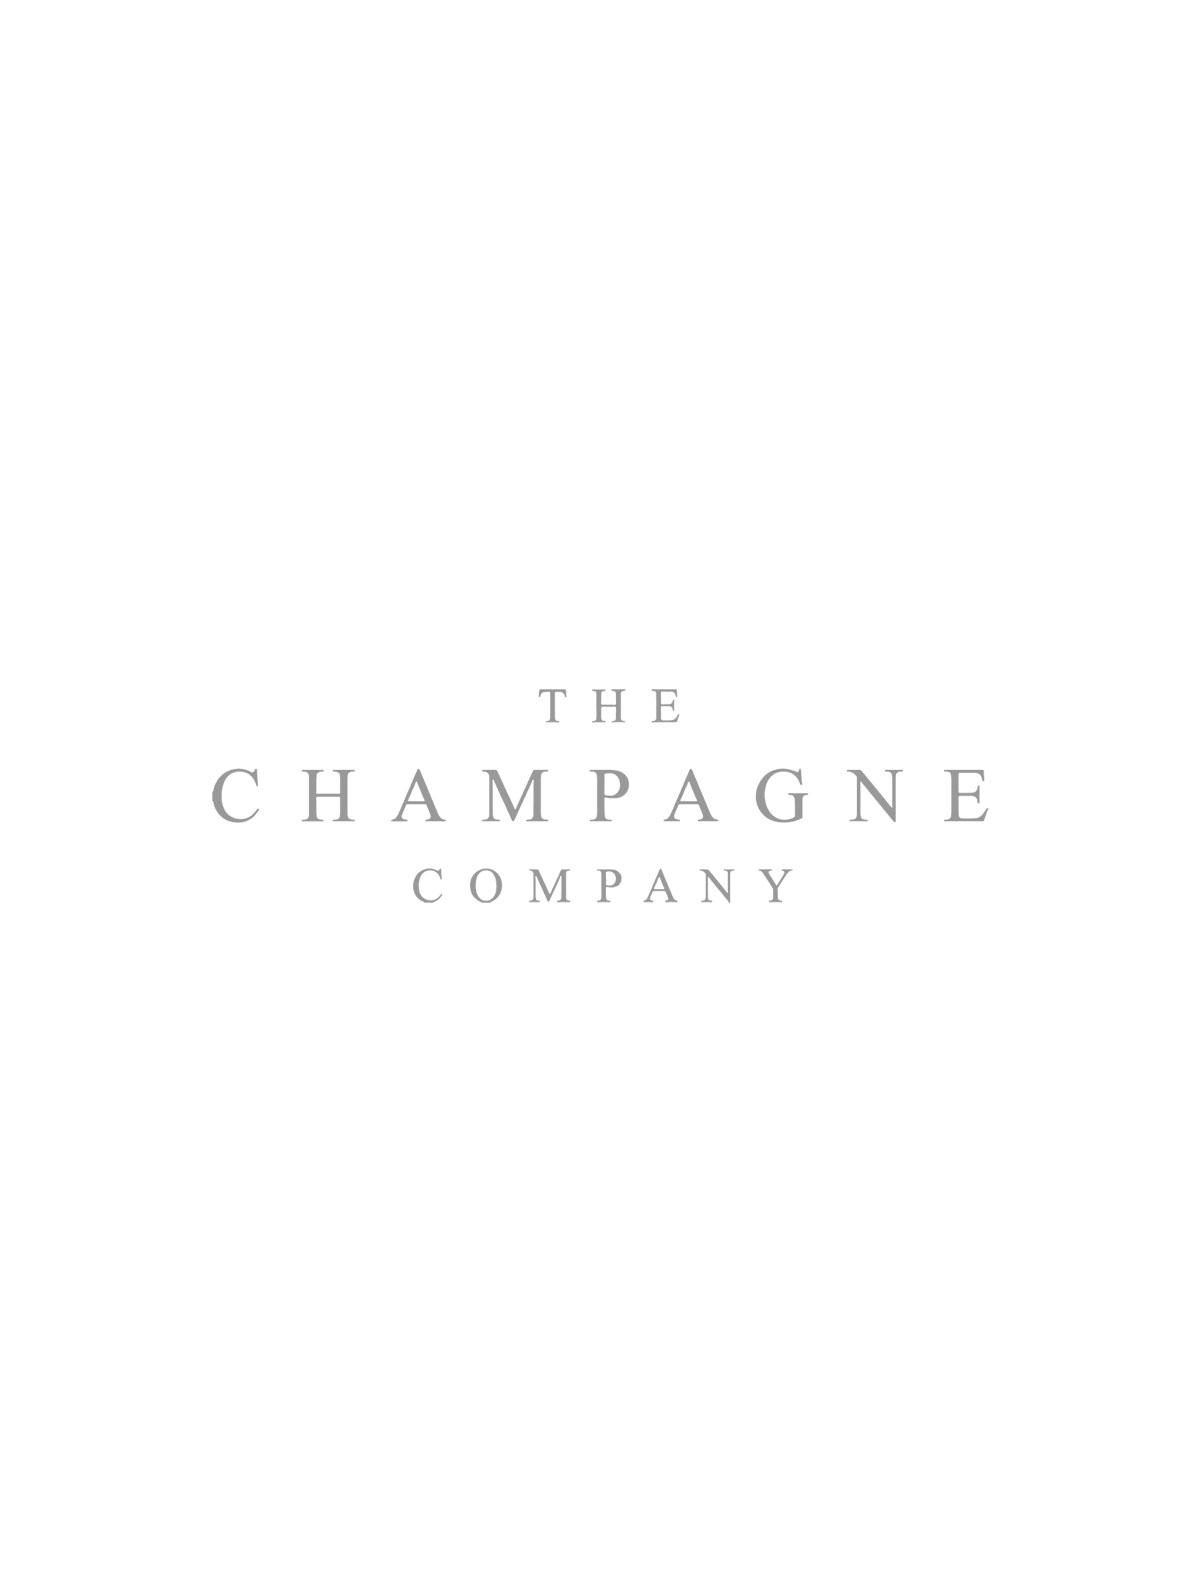 Codorniu Clasico 1872 Brut Cava Sparkling Wine Spain 75cl